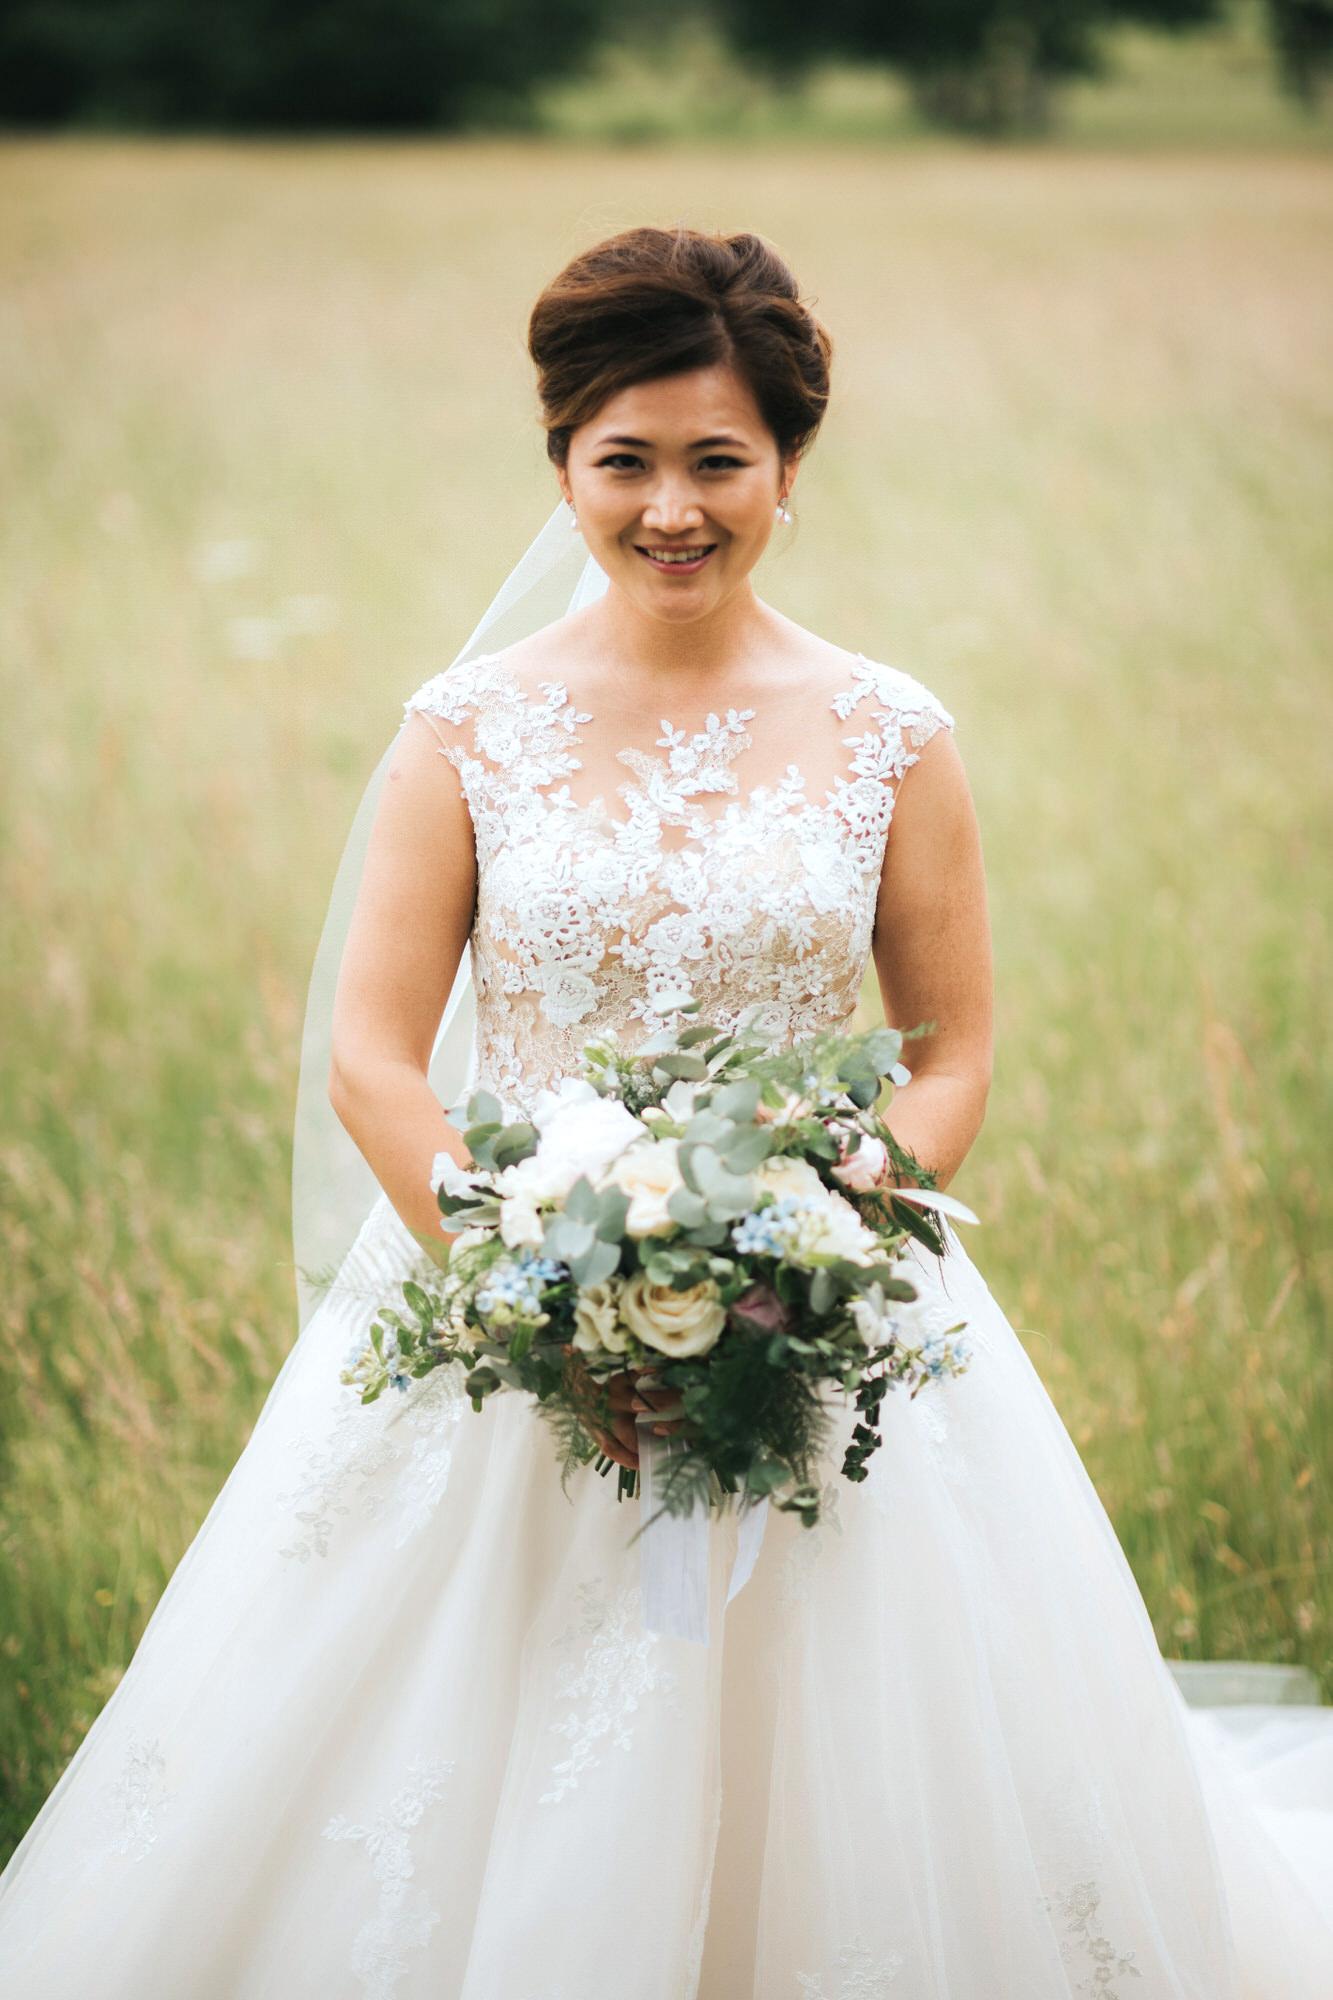 Lace detail wedding dress